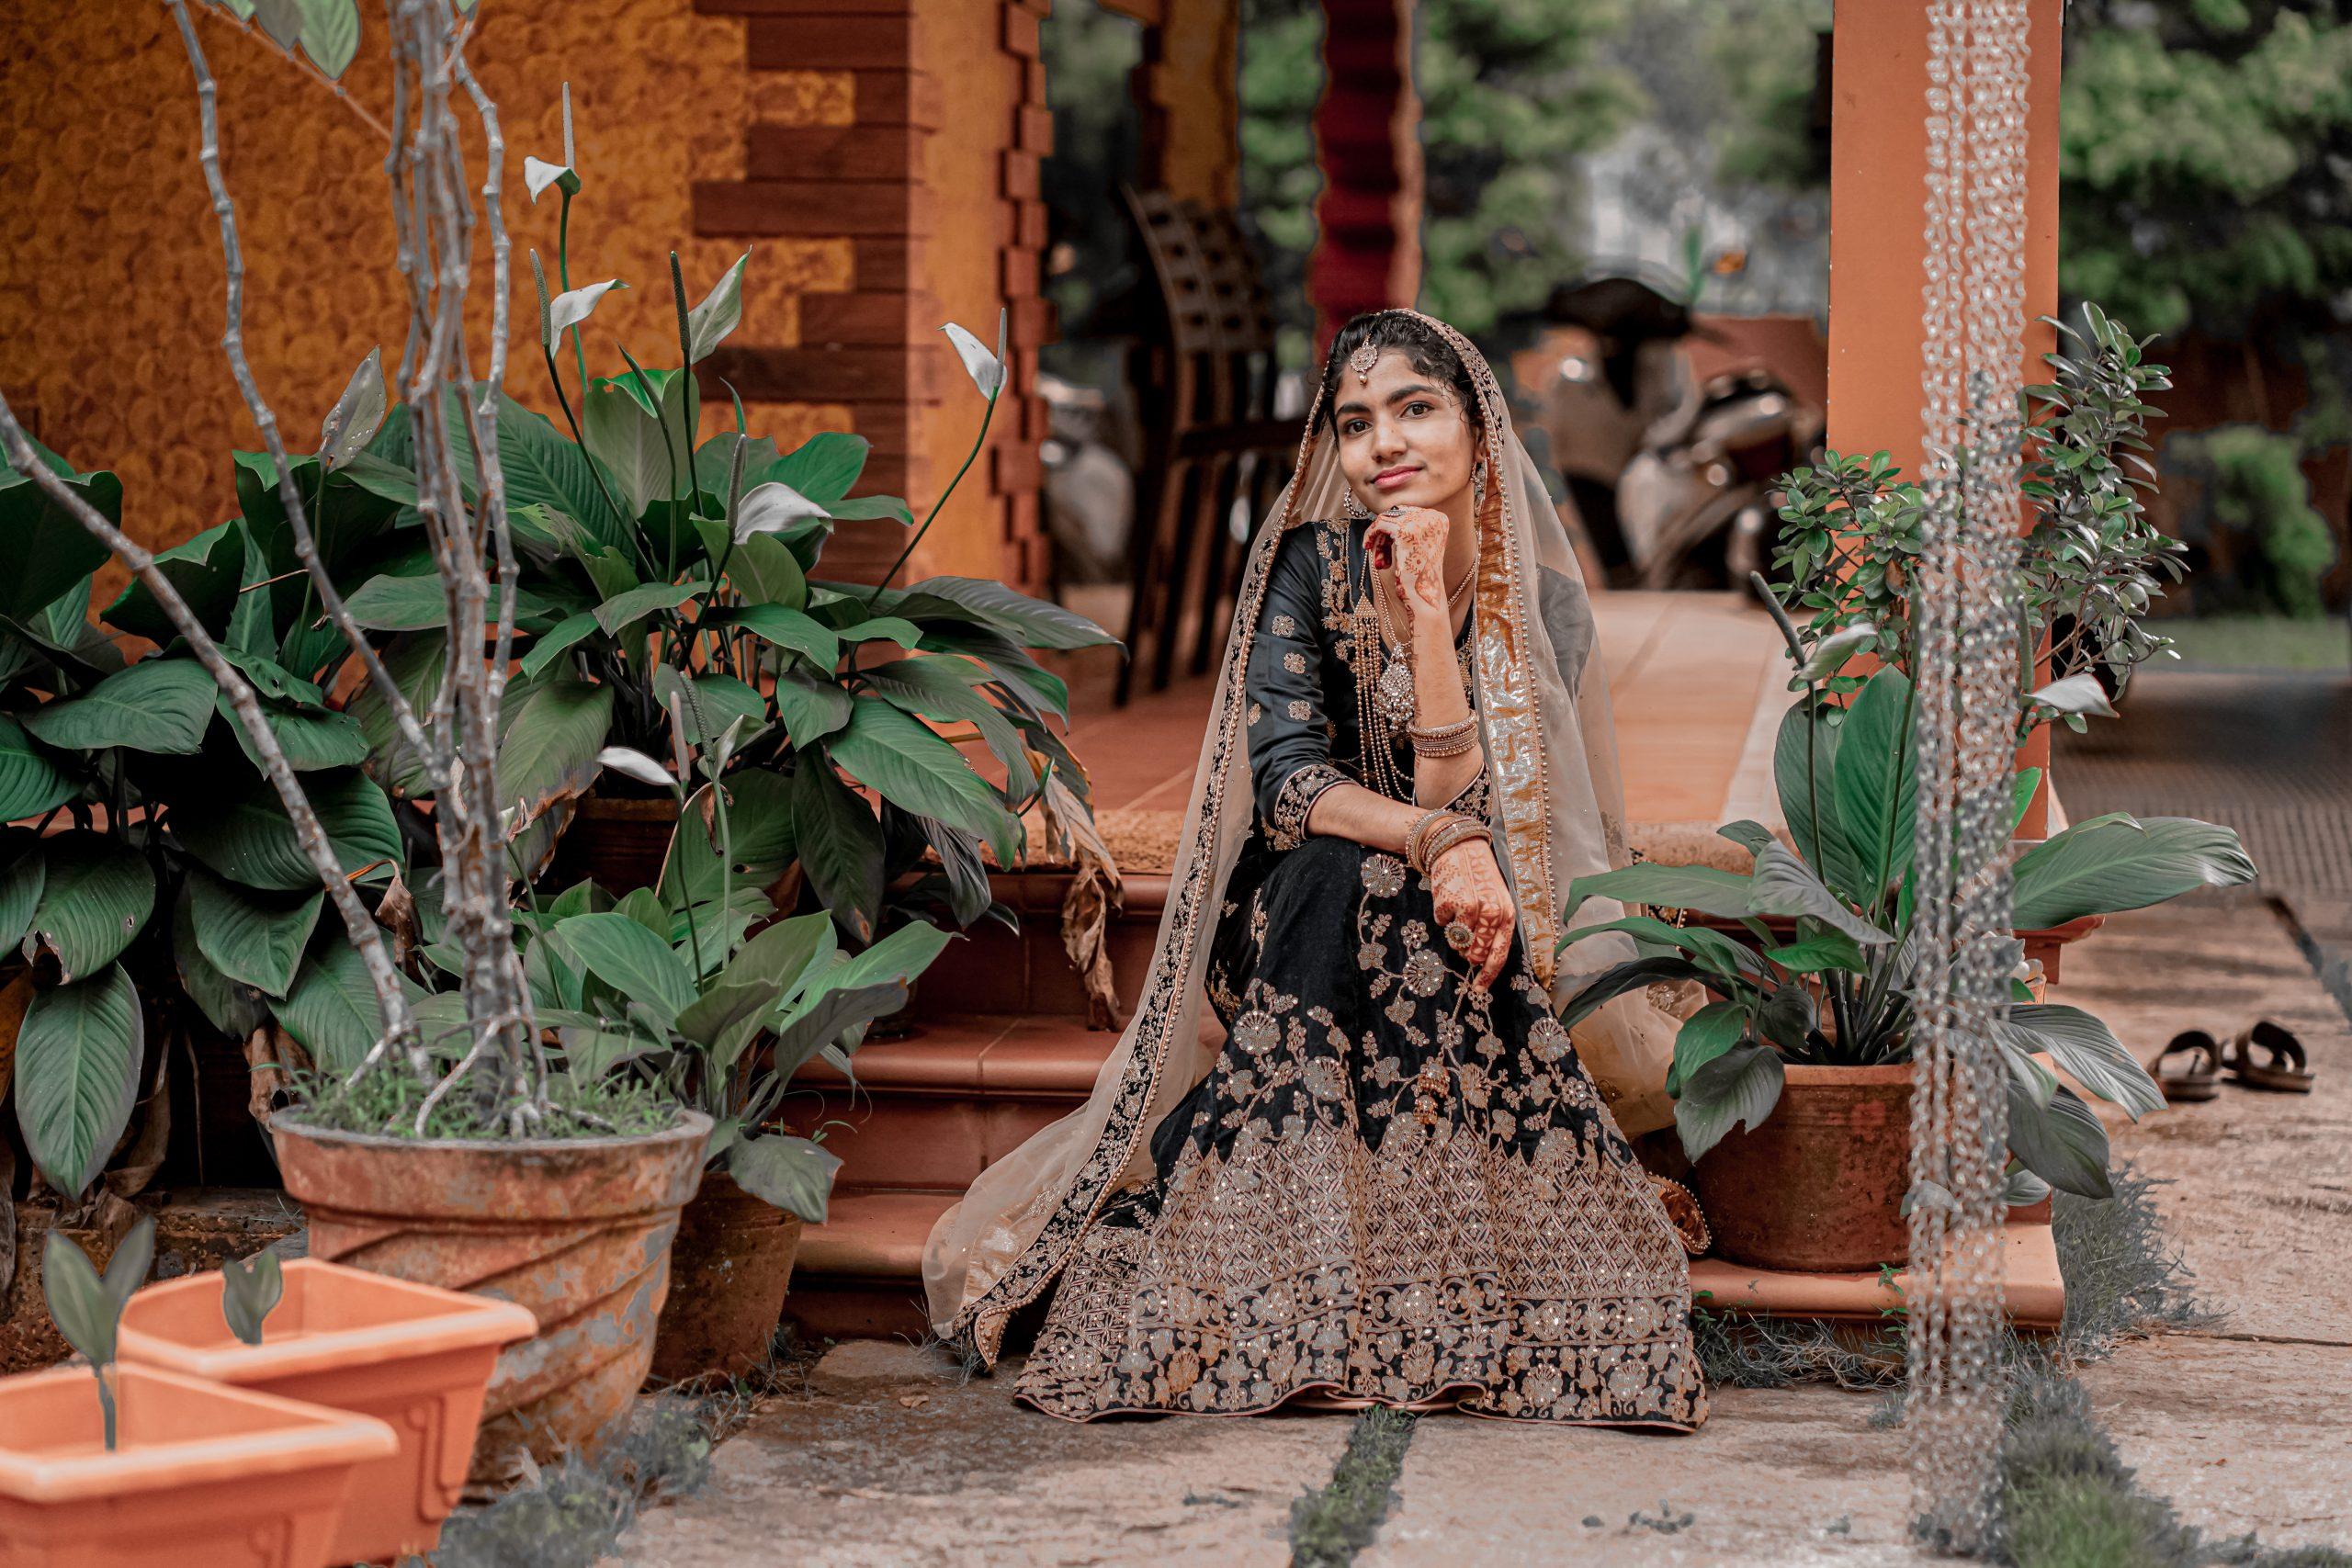 A girl sitting in a house garden